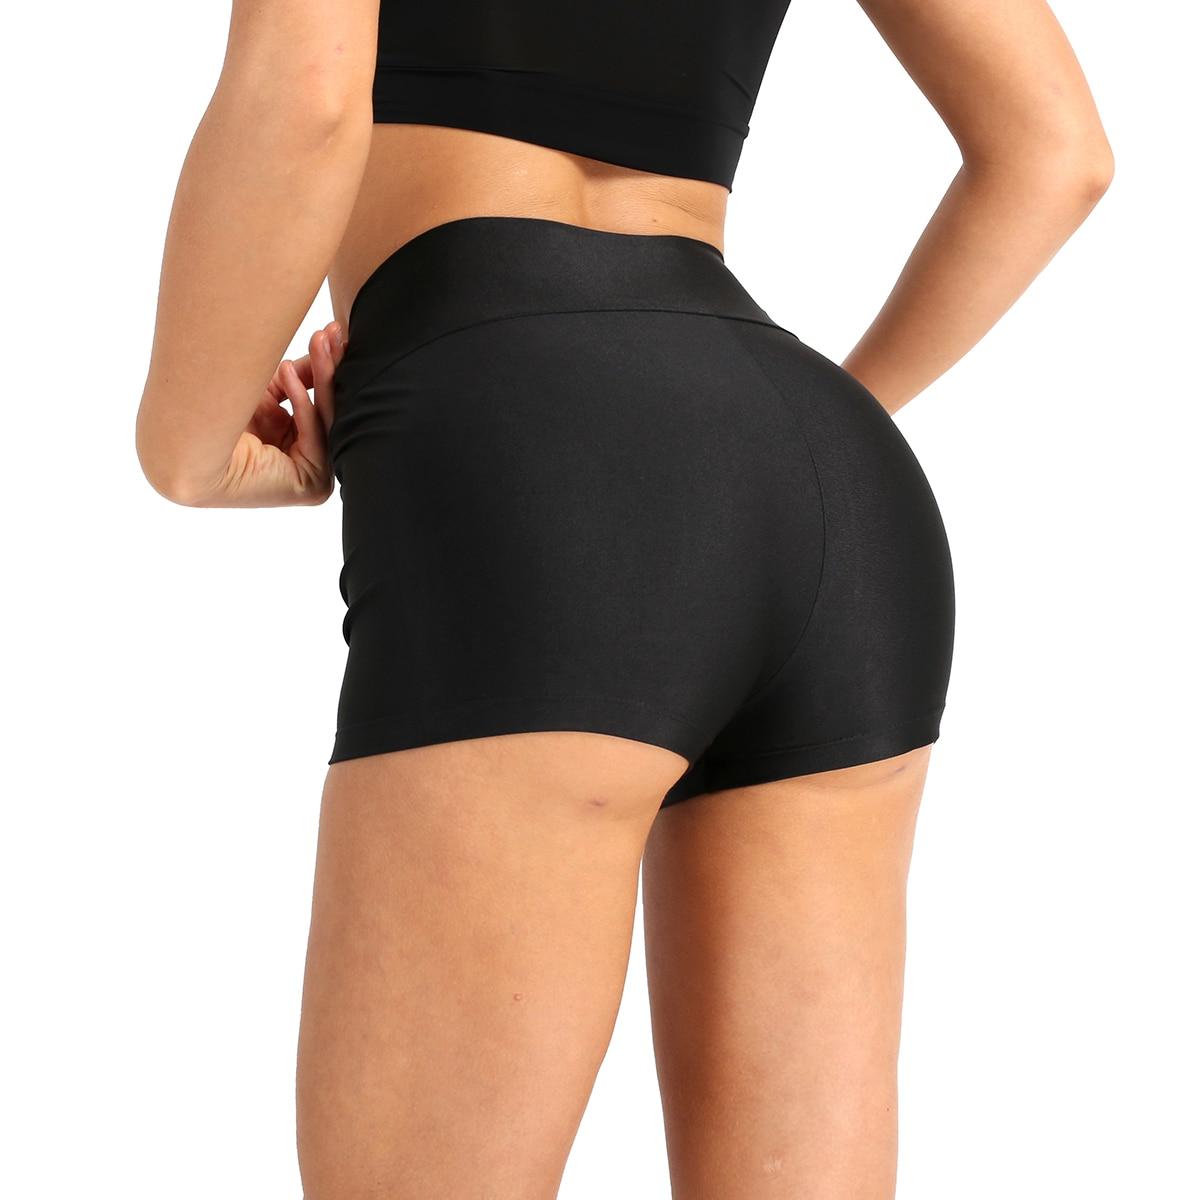 Women's Pole Dance Shorts Gymnastics Training Dance Sports Rave Shorts High Waist Skinny Yoga Short Pants Rave Clothes Clubwear